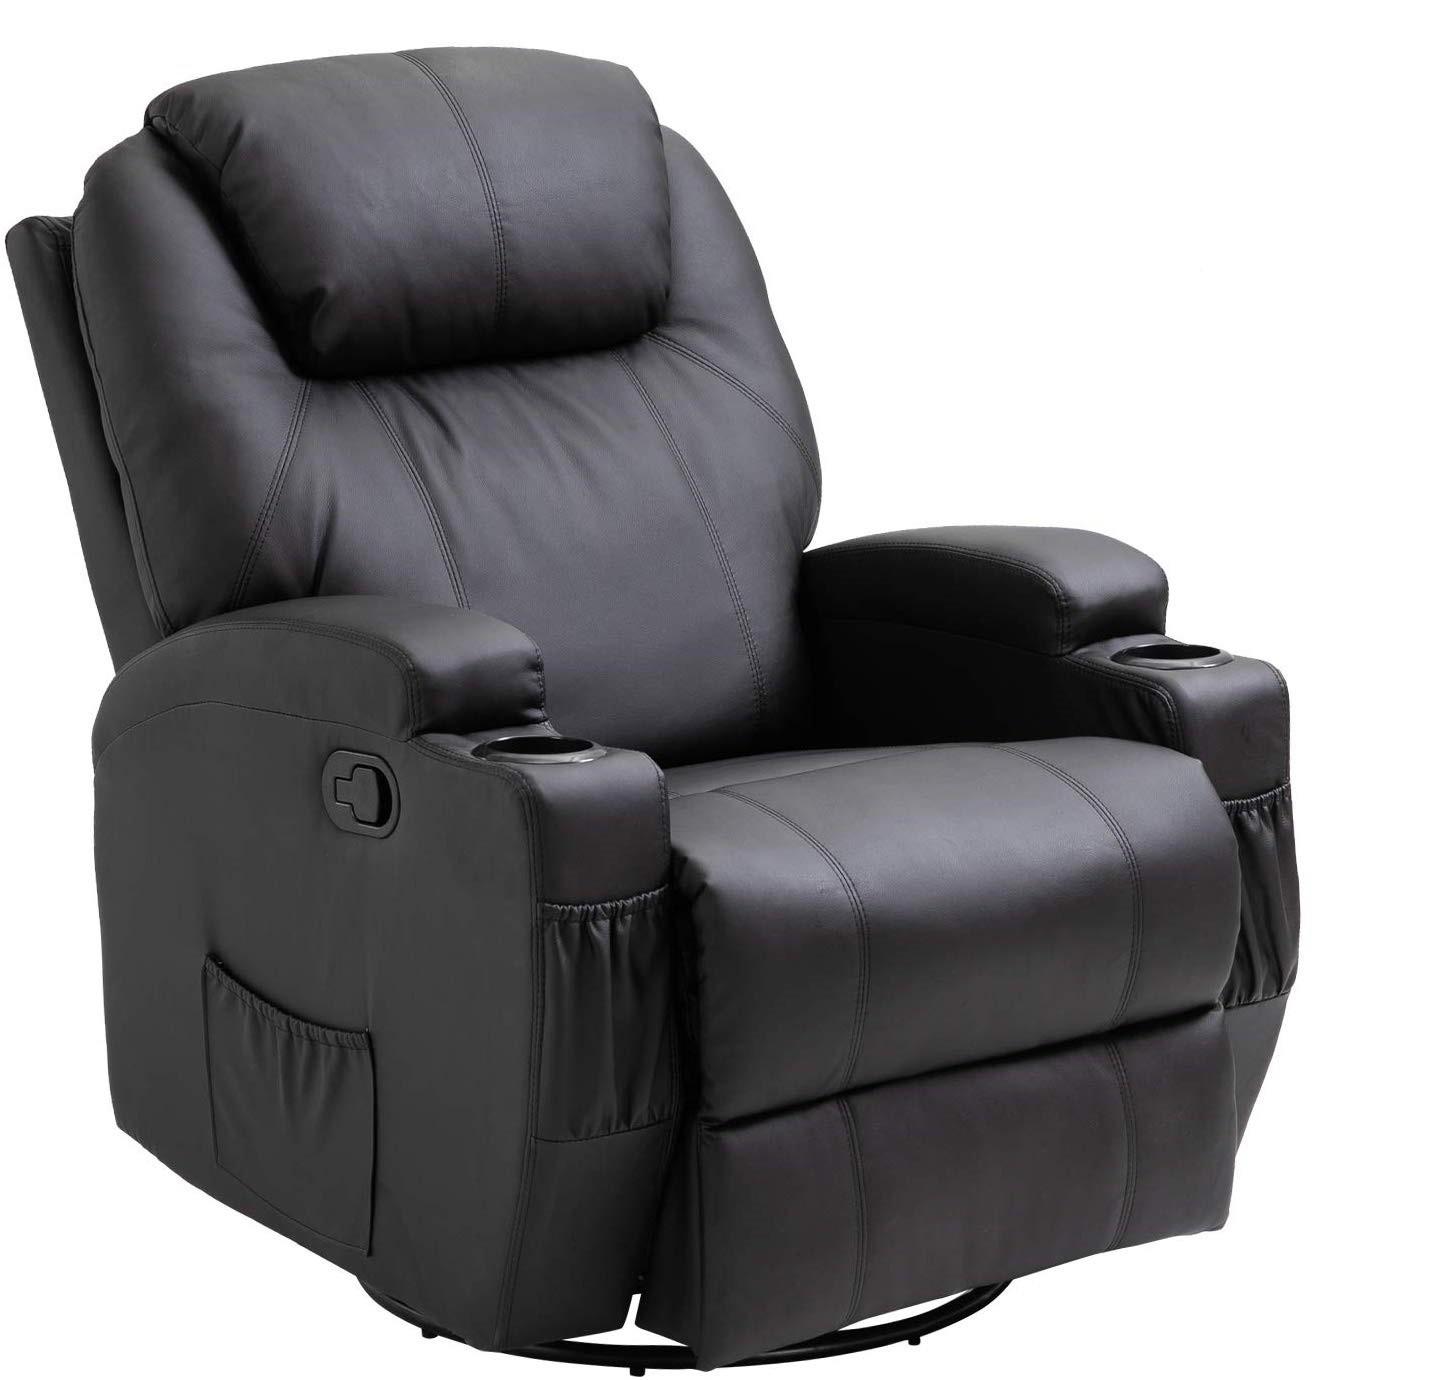 HomCom Massage and Heating recliner